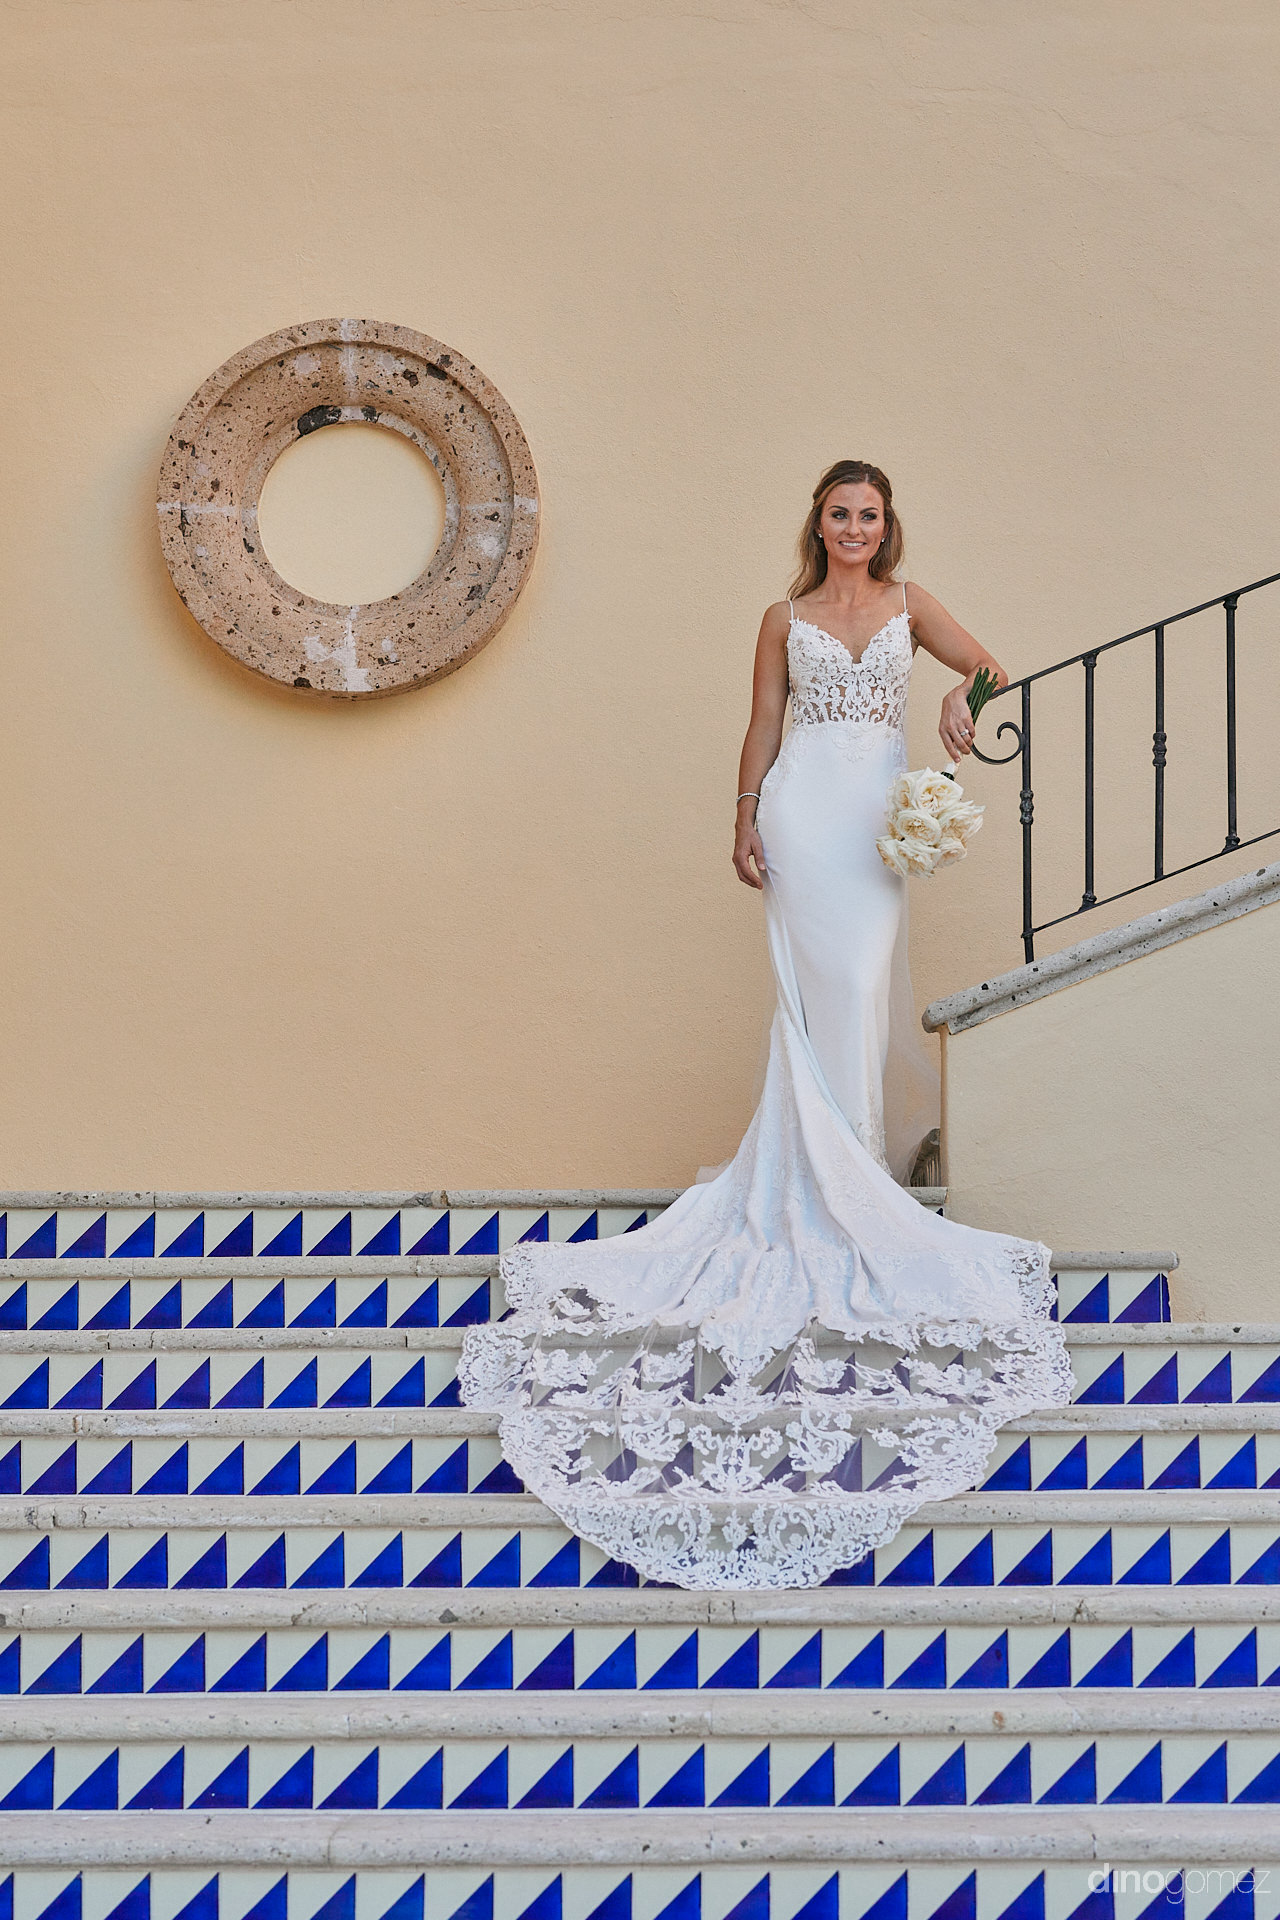 Professional Photographer Todos Santos - Luxury Wedding Photographer In Cabo Dino Gomez - C&T